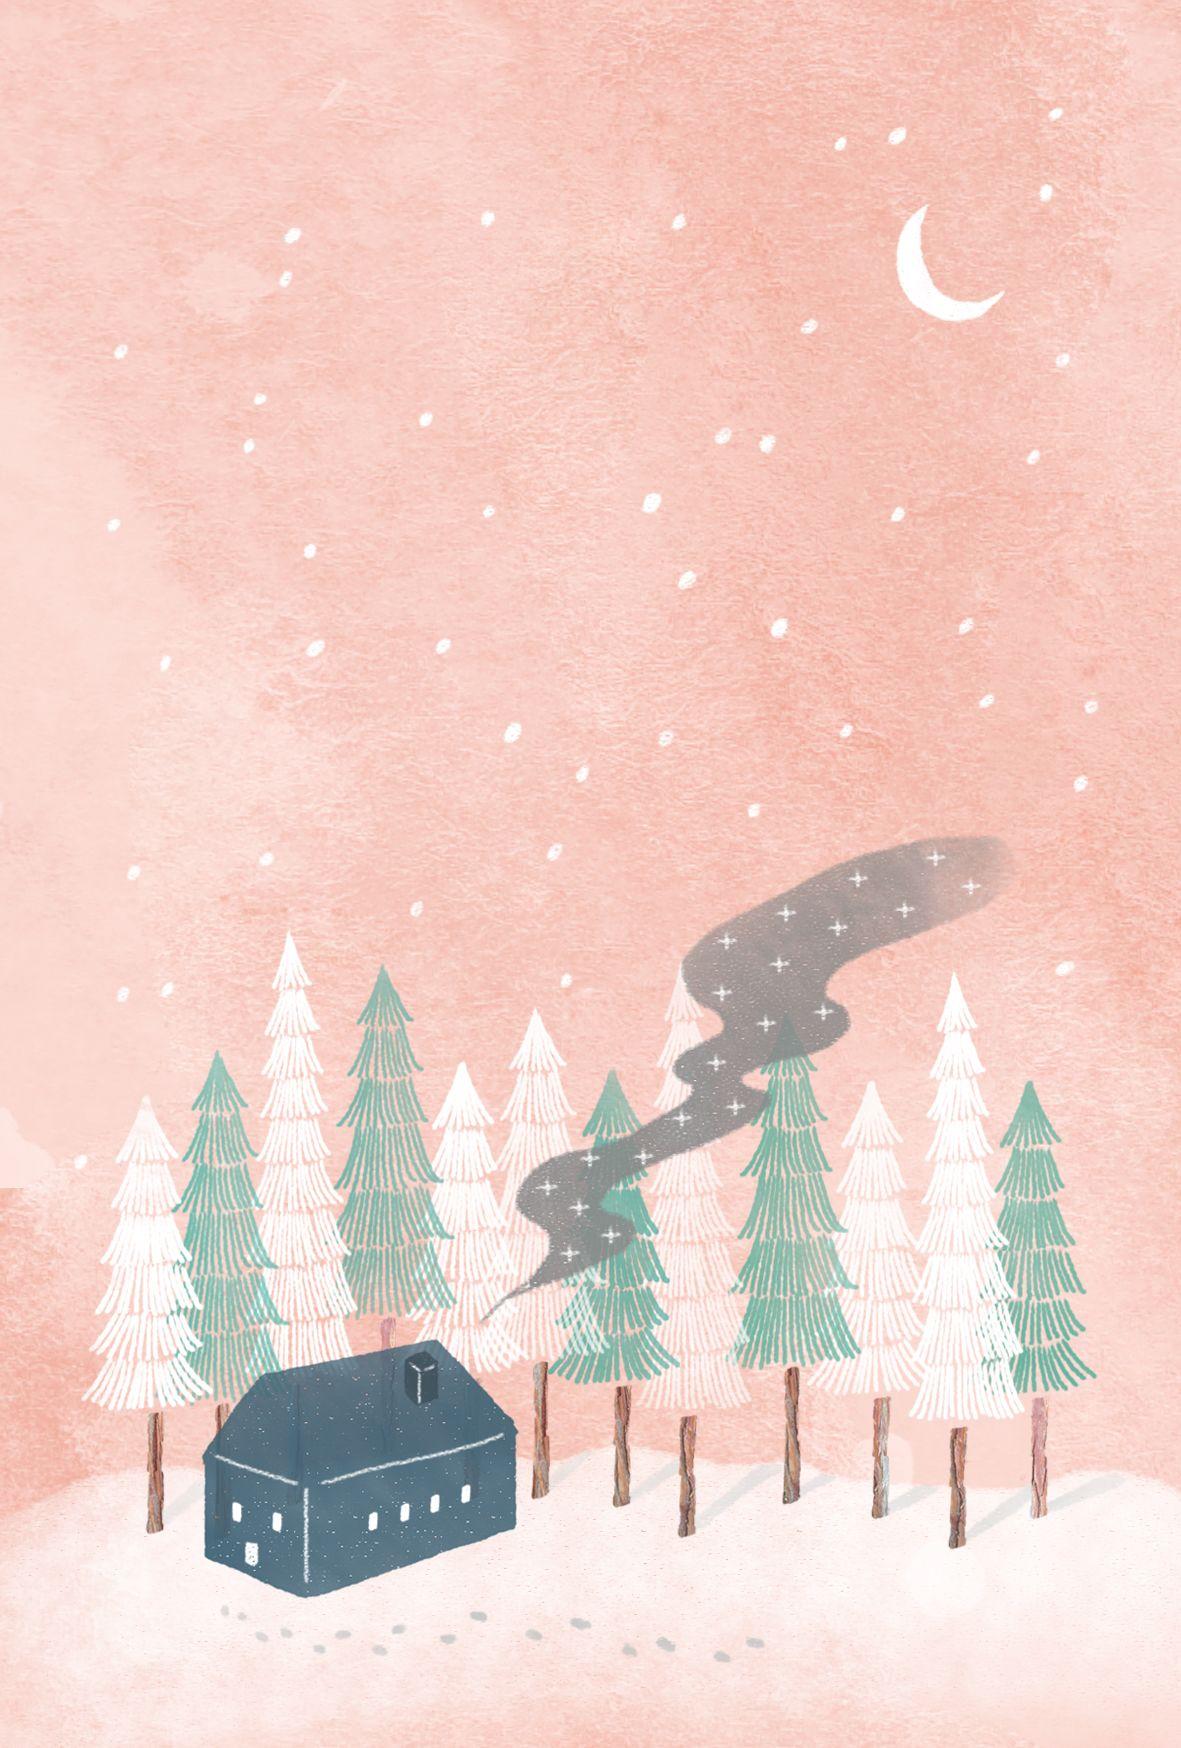 Warm Winter On Behance Winter Wallpaper Winter Illustration Painting Snow